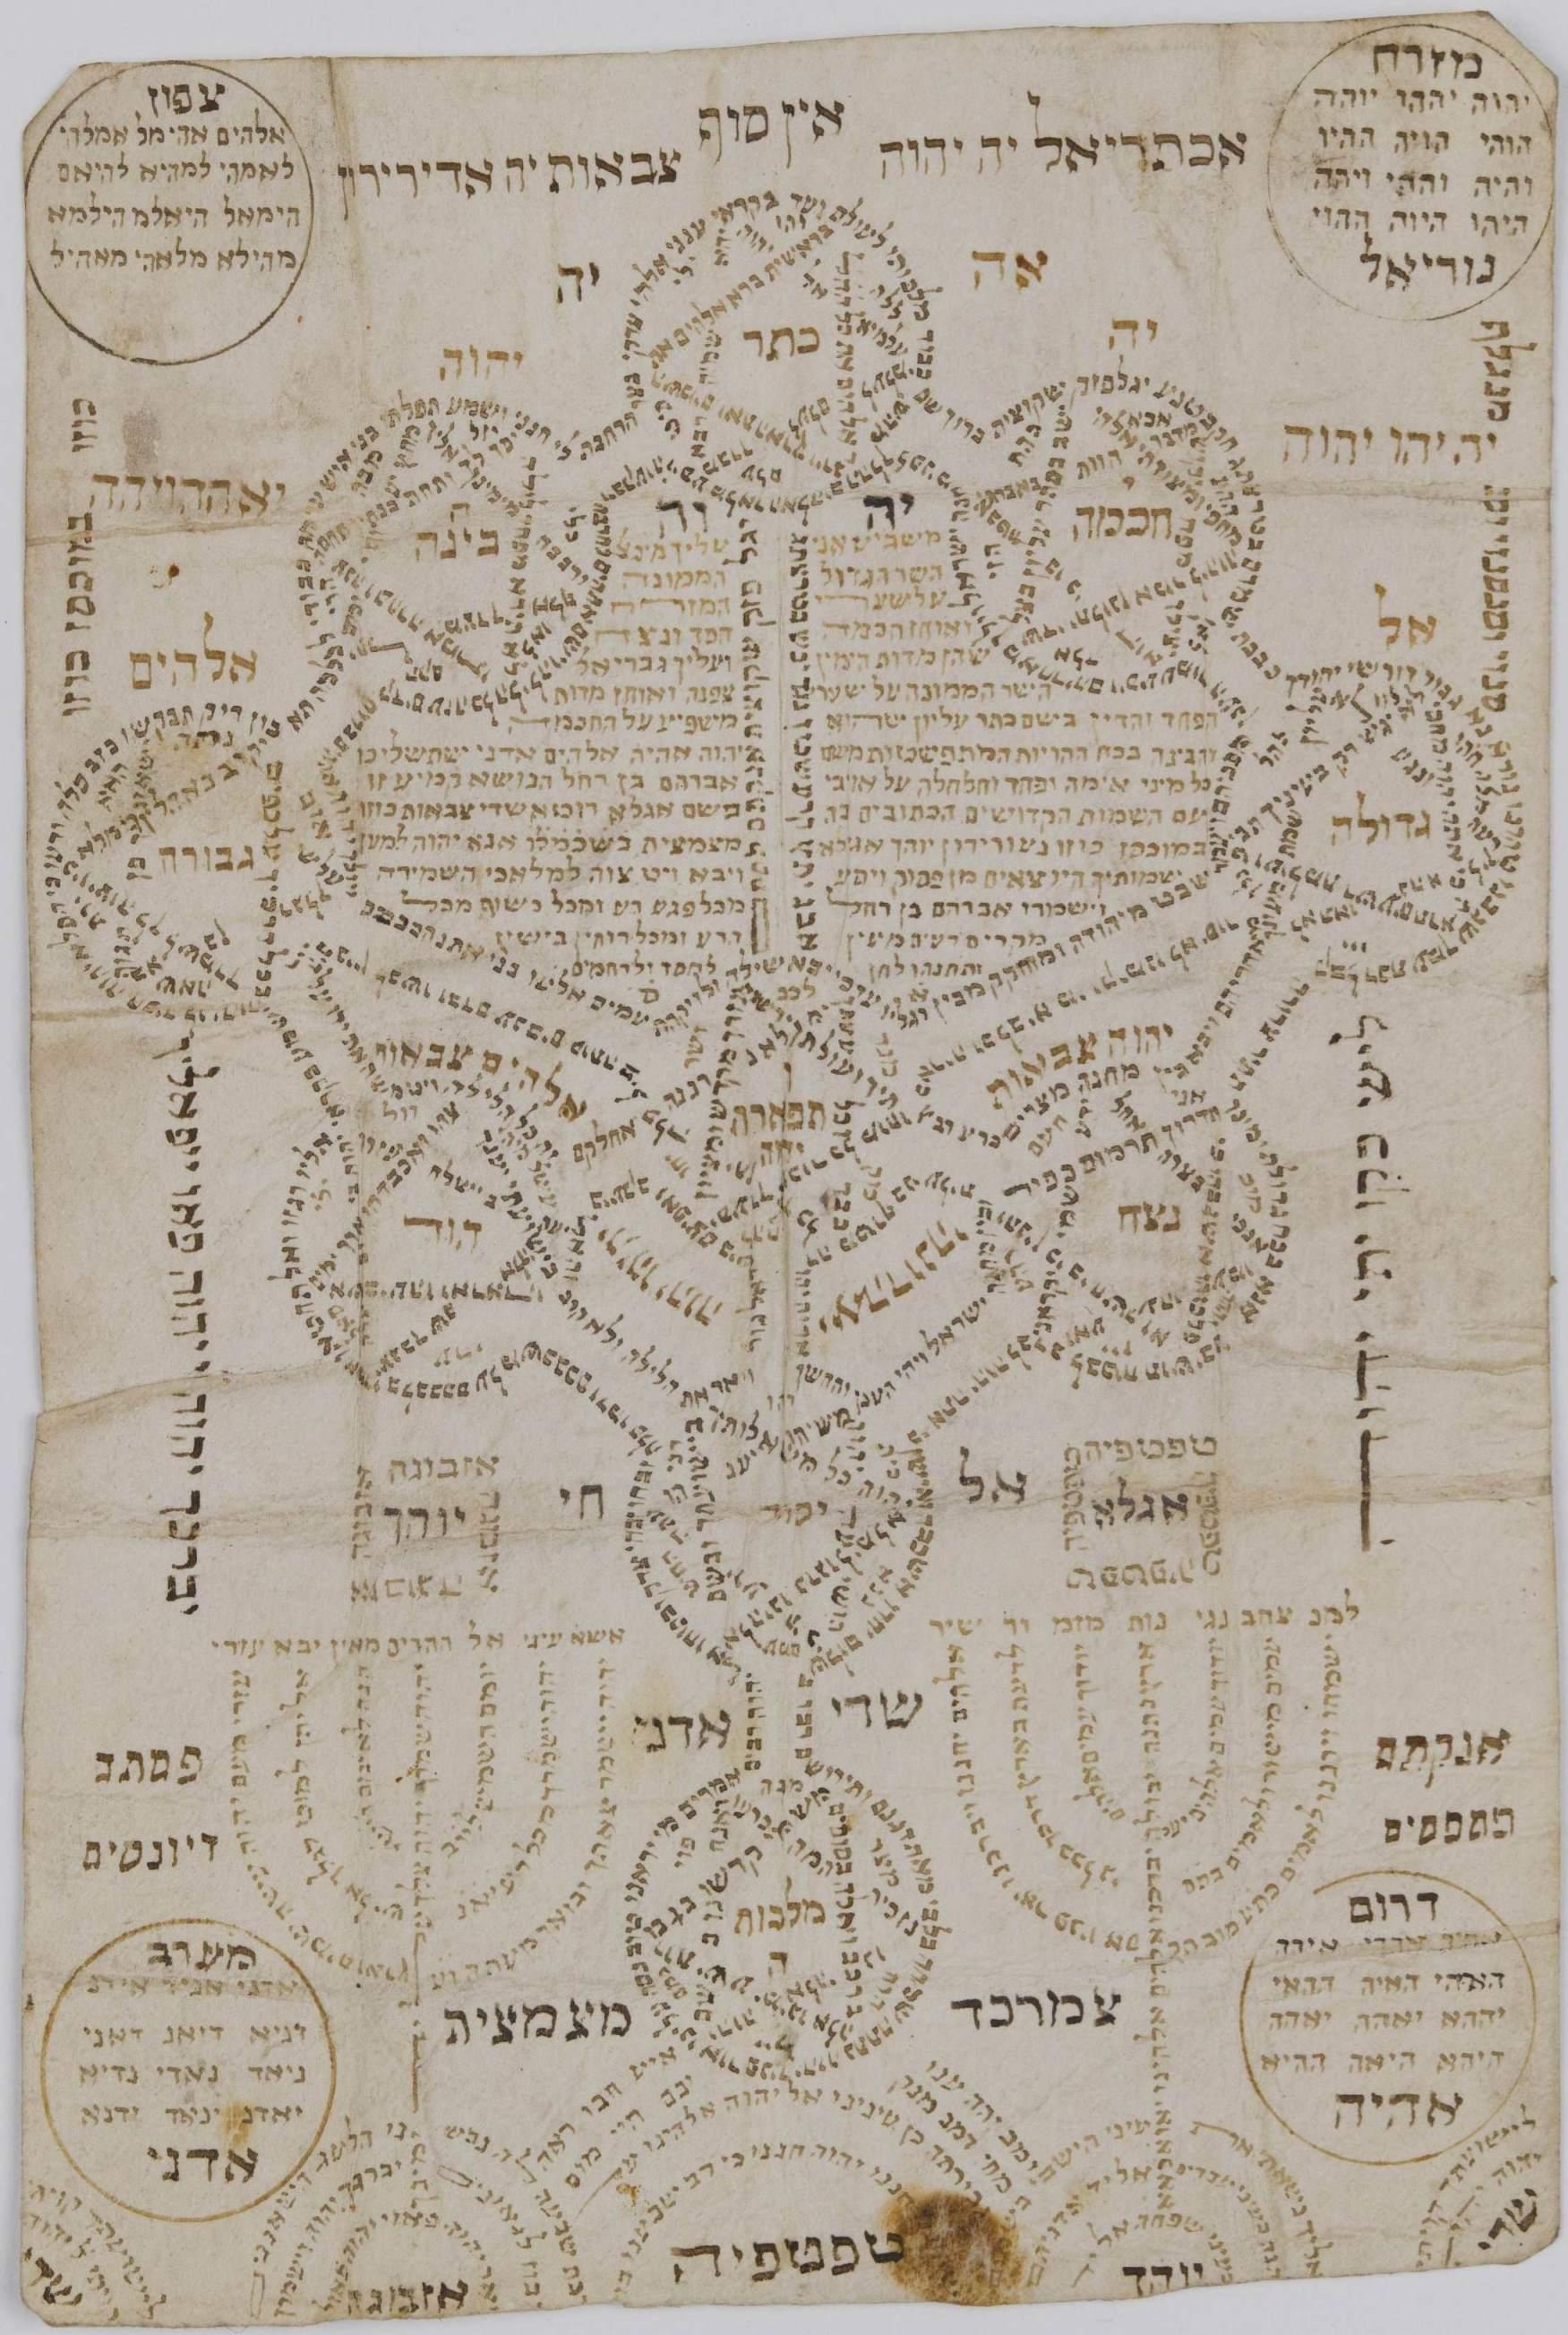 Ilan Sefirot, mapa cabalístico de la divinidad. Ámsterdam, siglo XVIII (BNI)